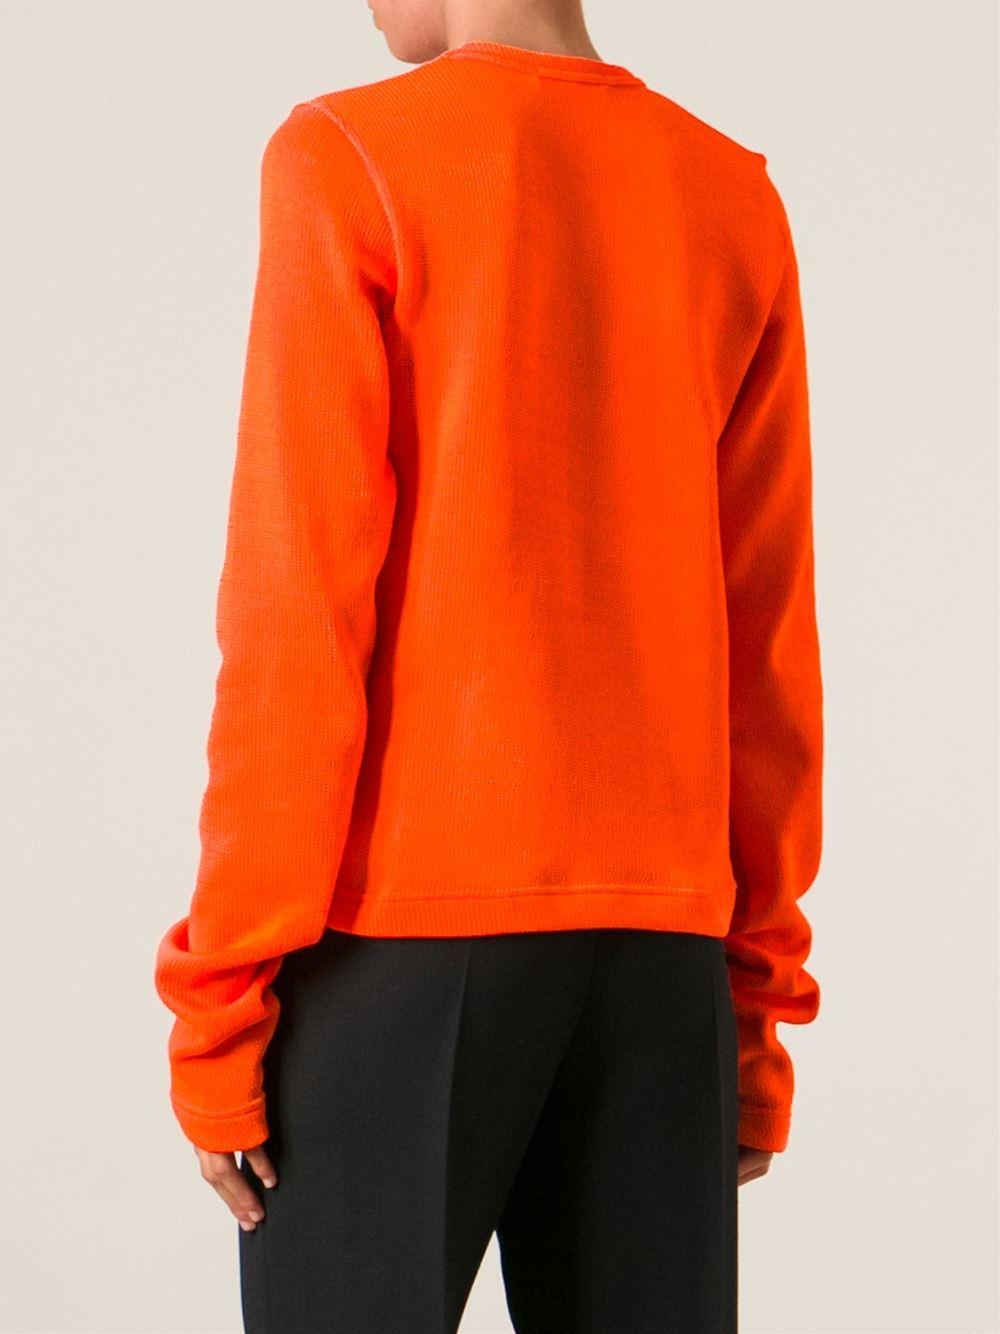 Comme des garçons Extra Long Sleeve Sweater in Orange | Lyst